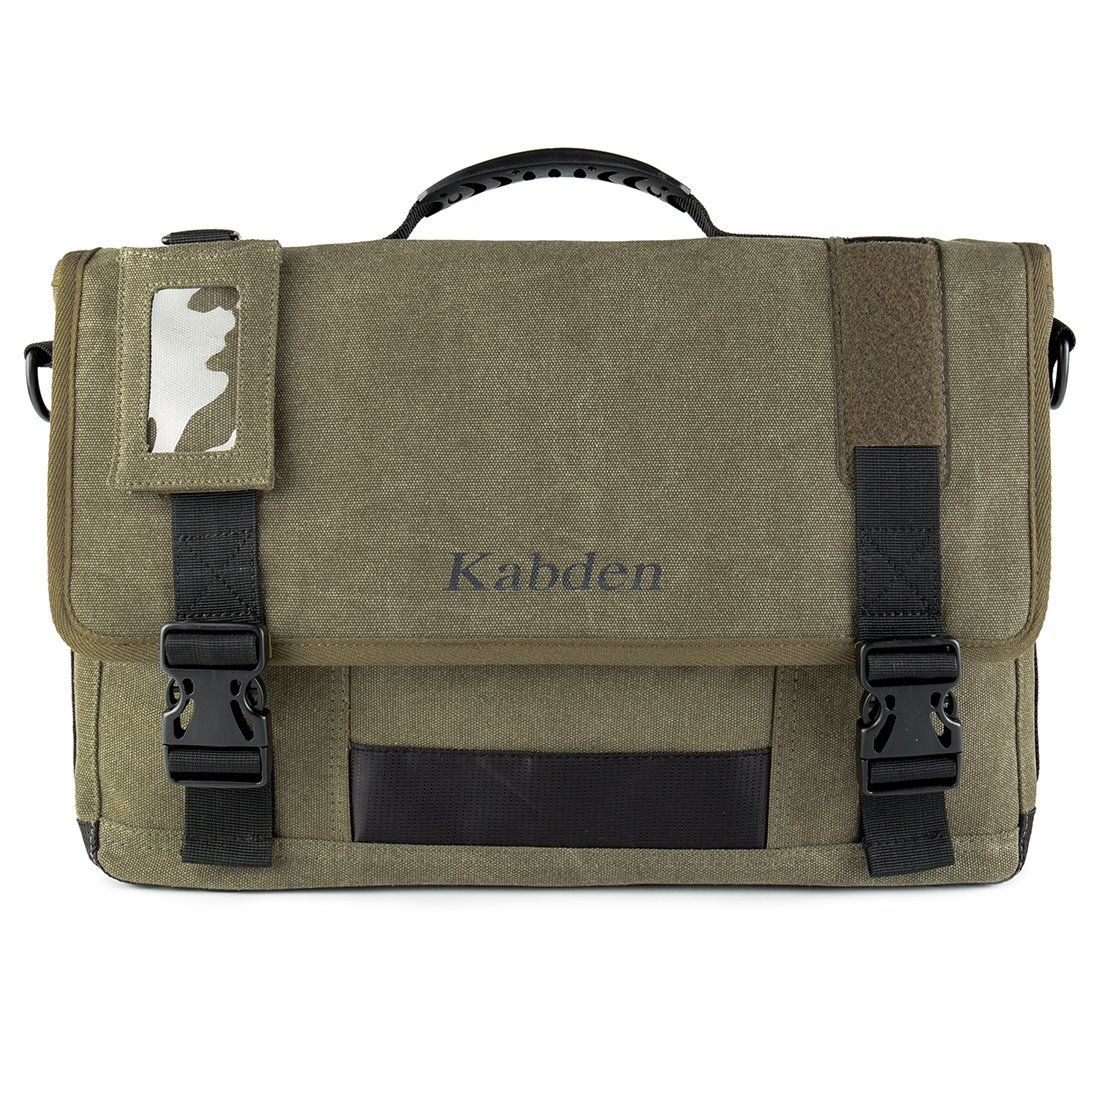 Anstorematealliance outdoor Bags アウトドアバッグ多機能キャンバスメッセンジャーラップトップバッグクロスボディショルダービジネスブリーフケースタブレットバッグハンドバッグ、サイズ:29x44x8.5cm(アーミーグリーン) B07RZ7749K Army Green